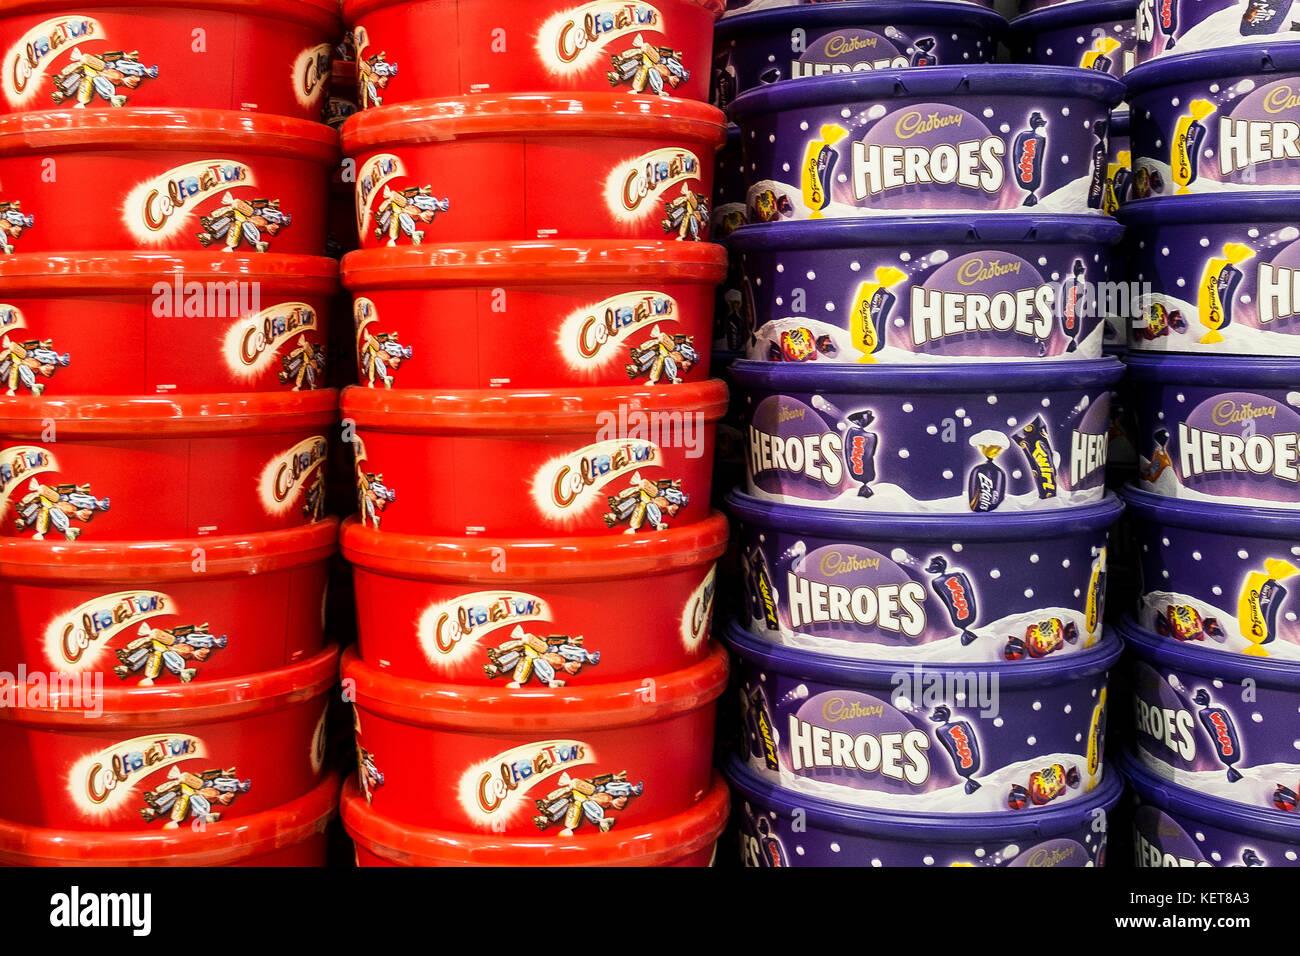 Cadbury Heroes Stock Photos Cadbury Heroes Stock Images